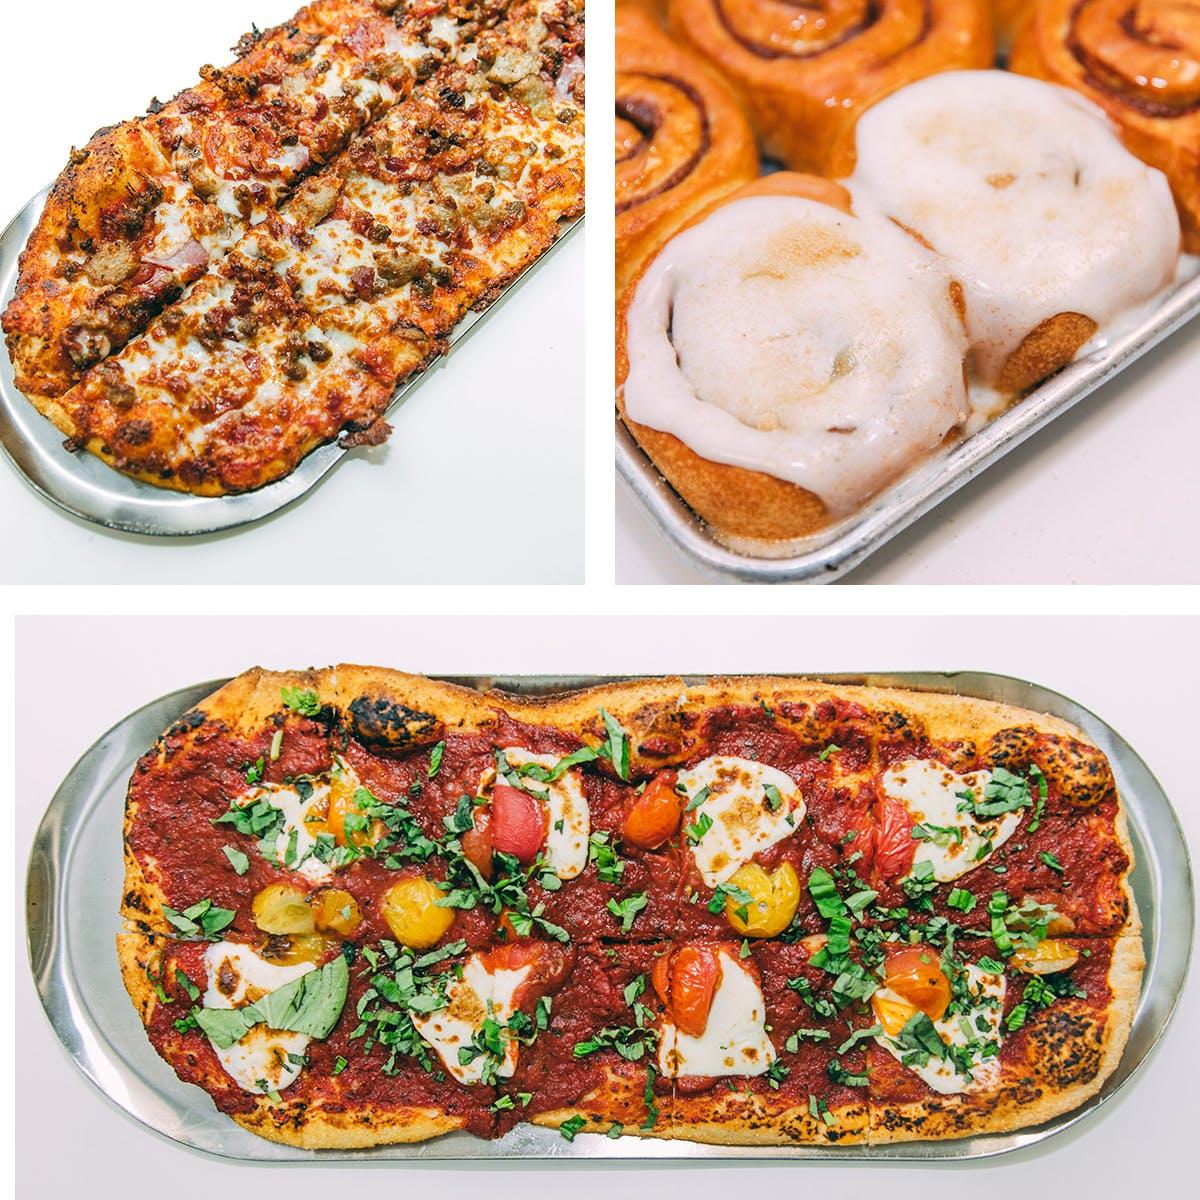 Slim & Husky's - 2 Pizzas + 12 Cinnamon Rolls - Choose Your Own